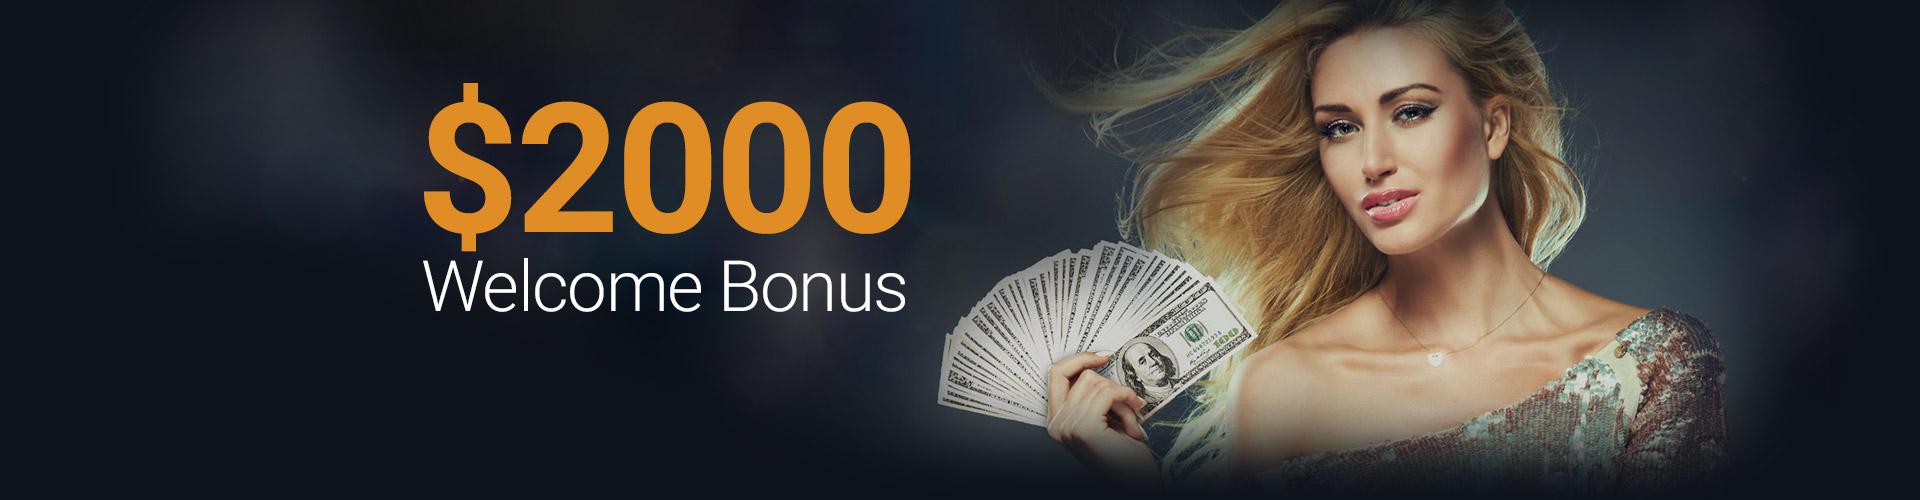 Get Instant Payments At Brango Casino Plus 30 No Deposit